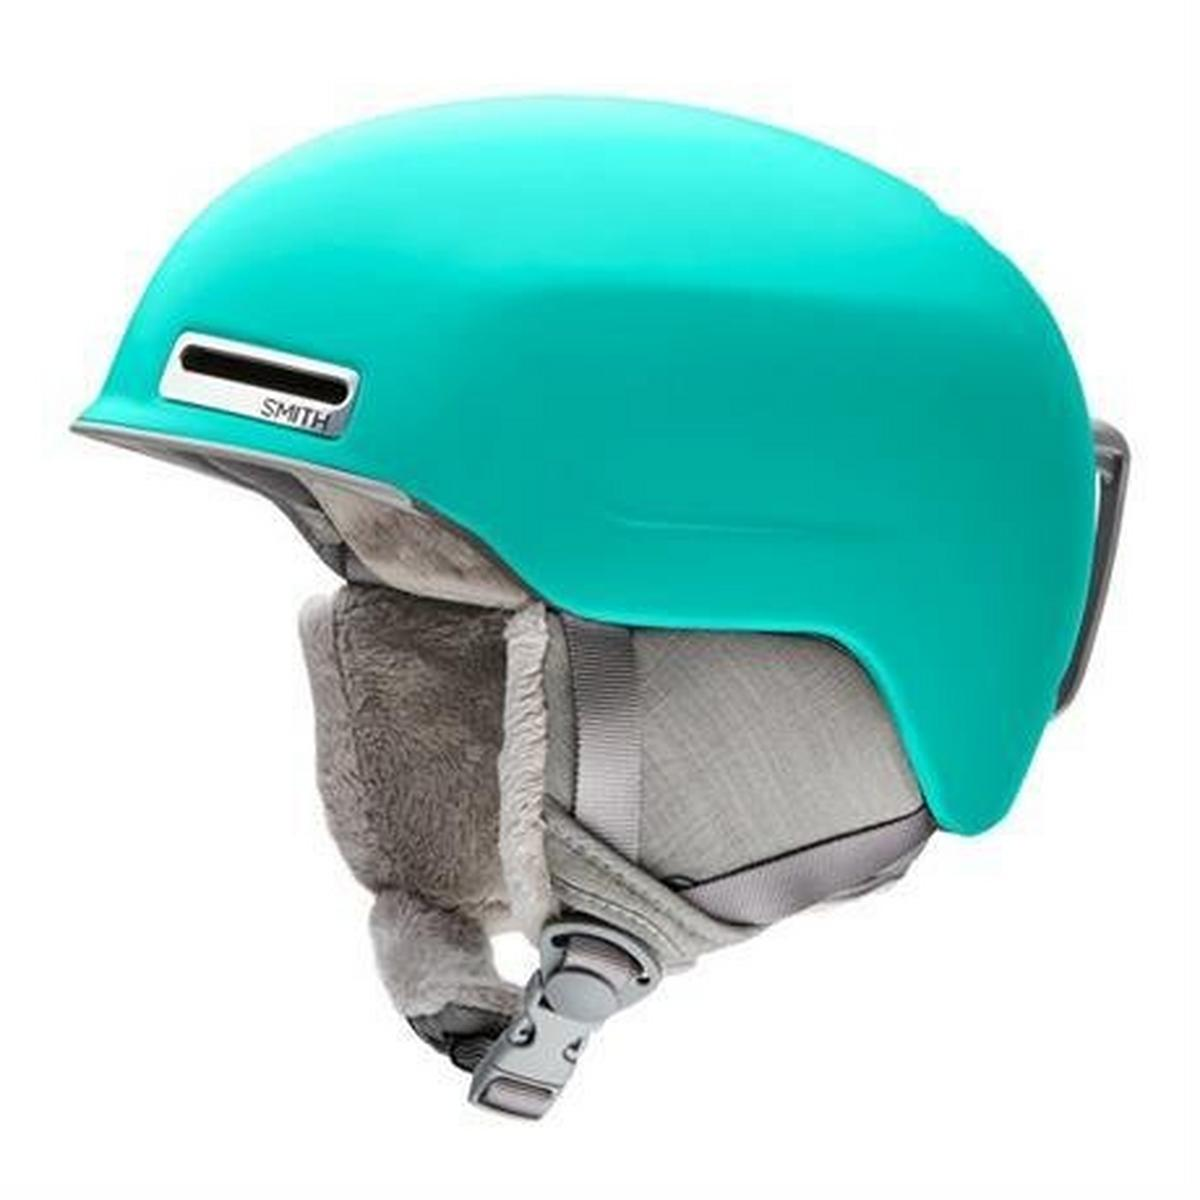 Smith Optics Smith Ski Helmet Women's Allure Matte Opal